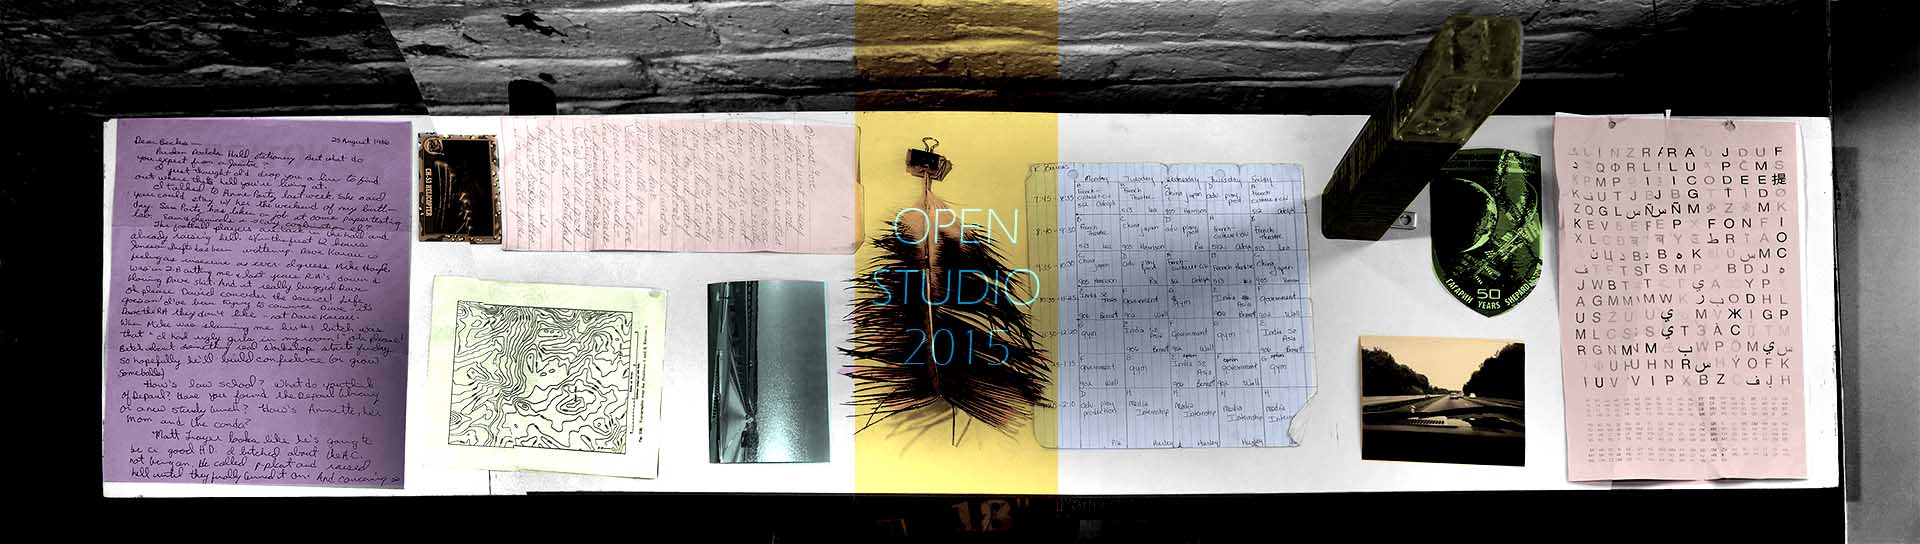 open studios scraps 2015